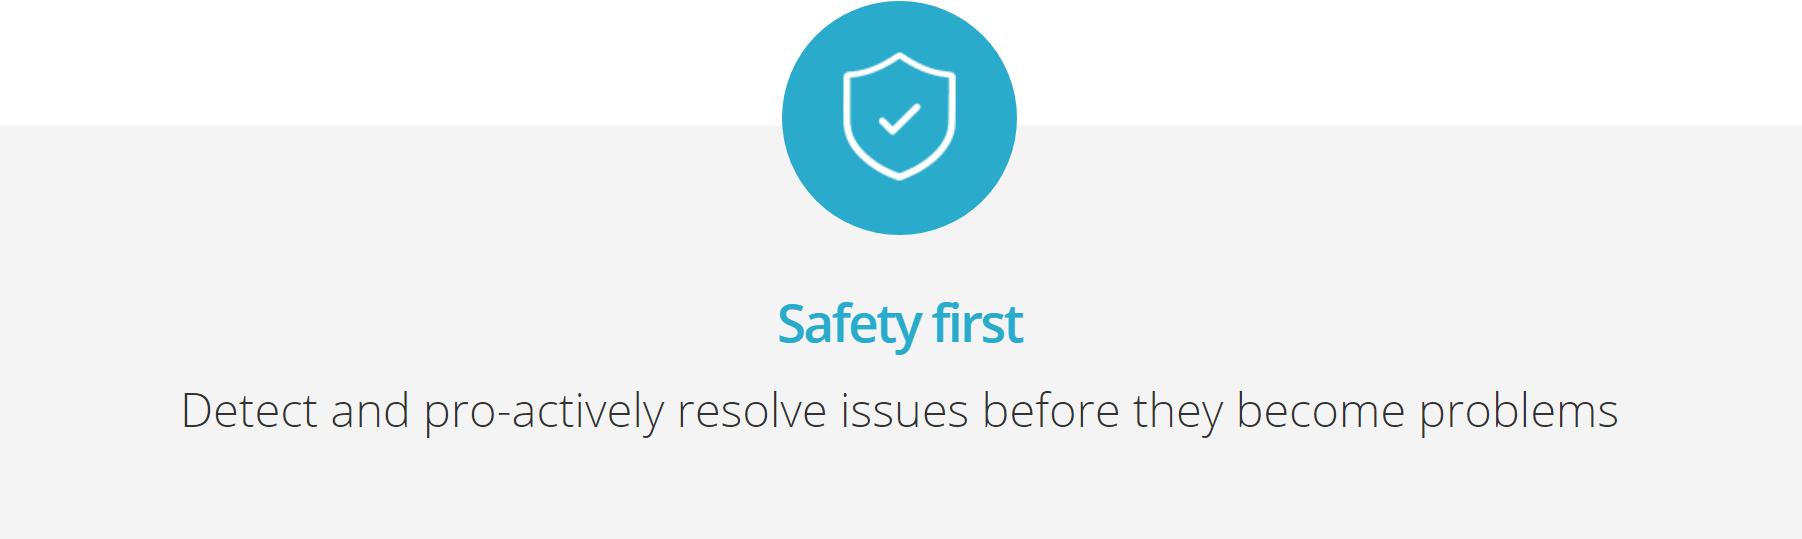 Qustodio Safety First 2